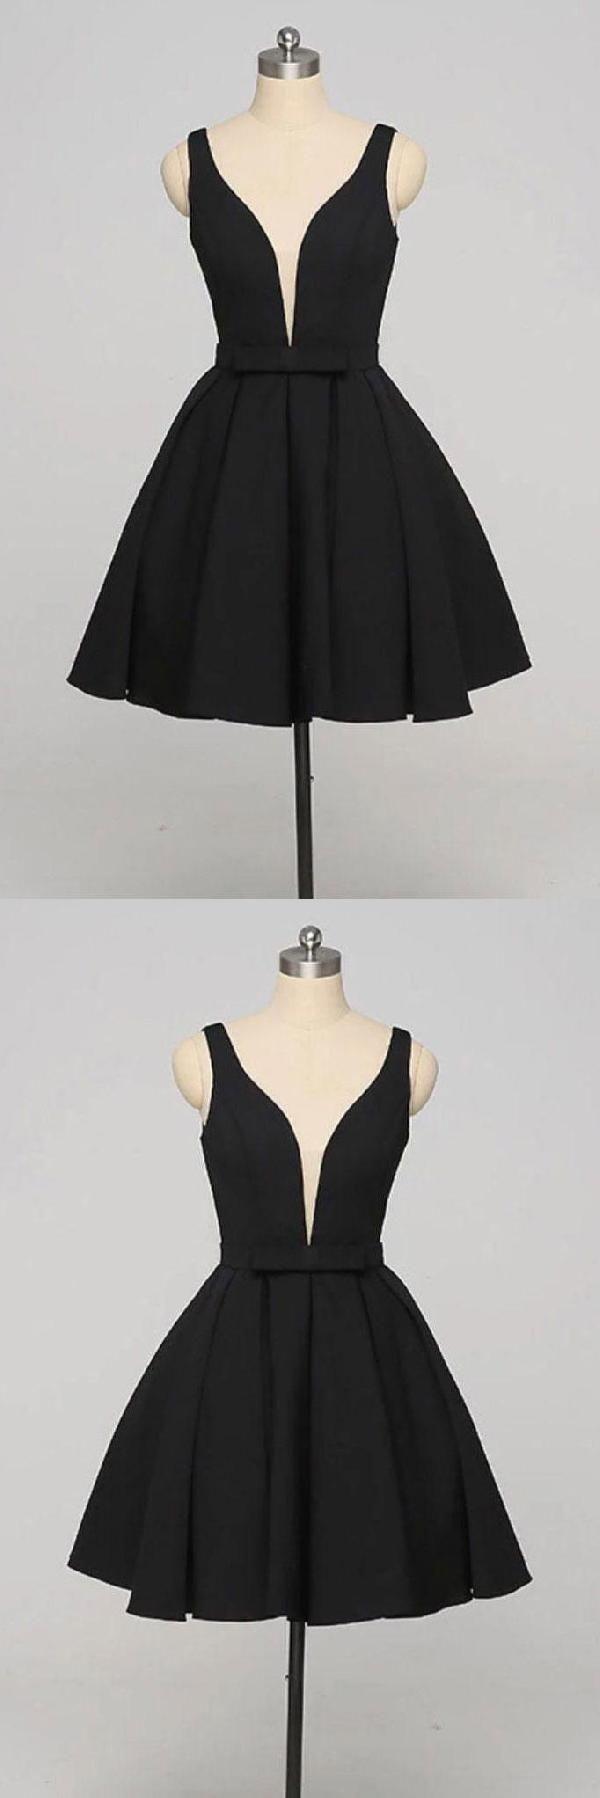 Vneck black seve homecoming dresses pinterest